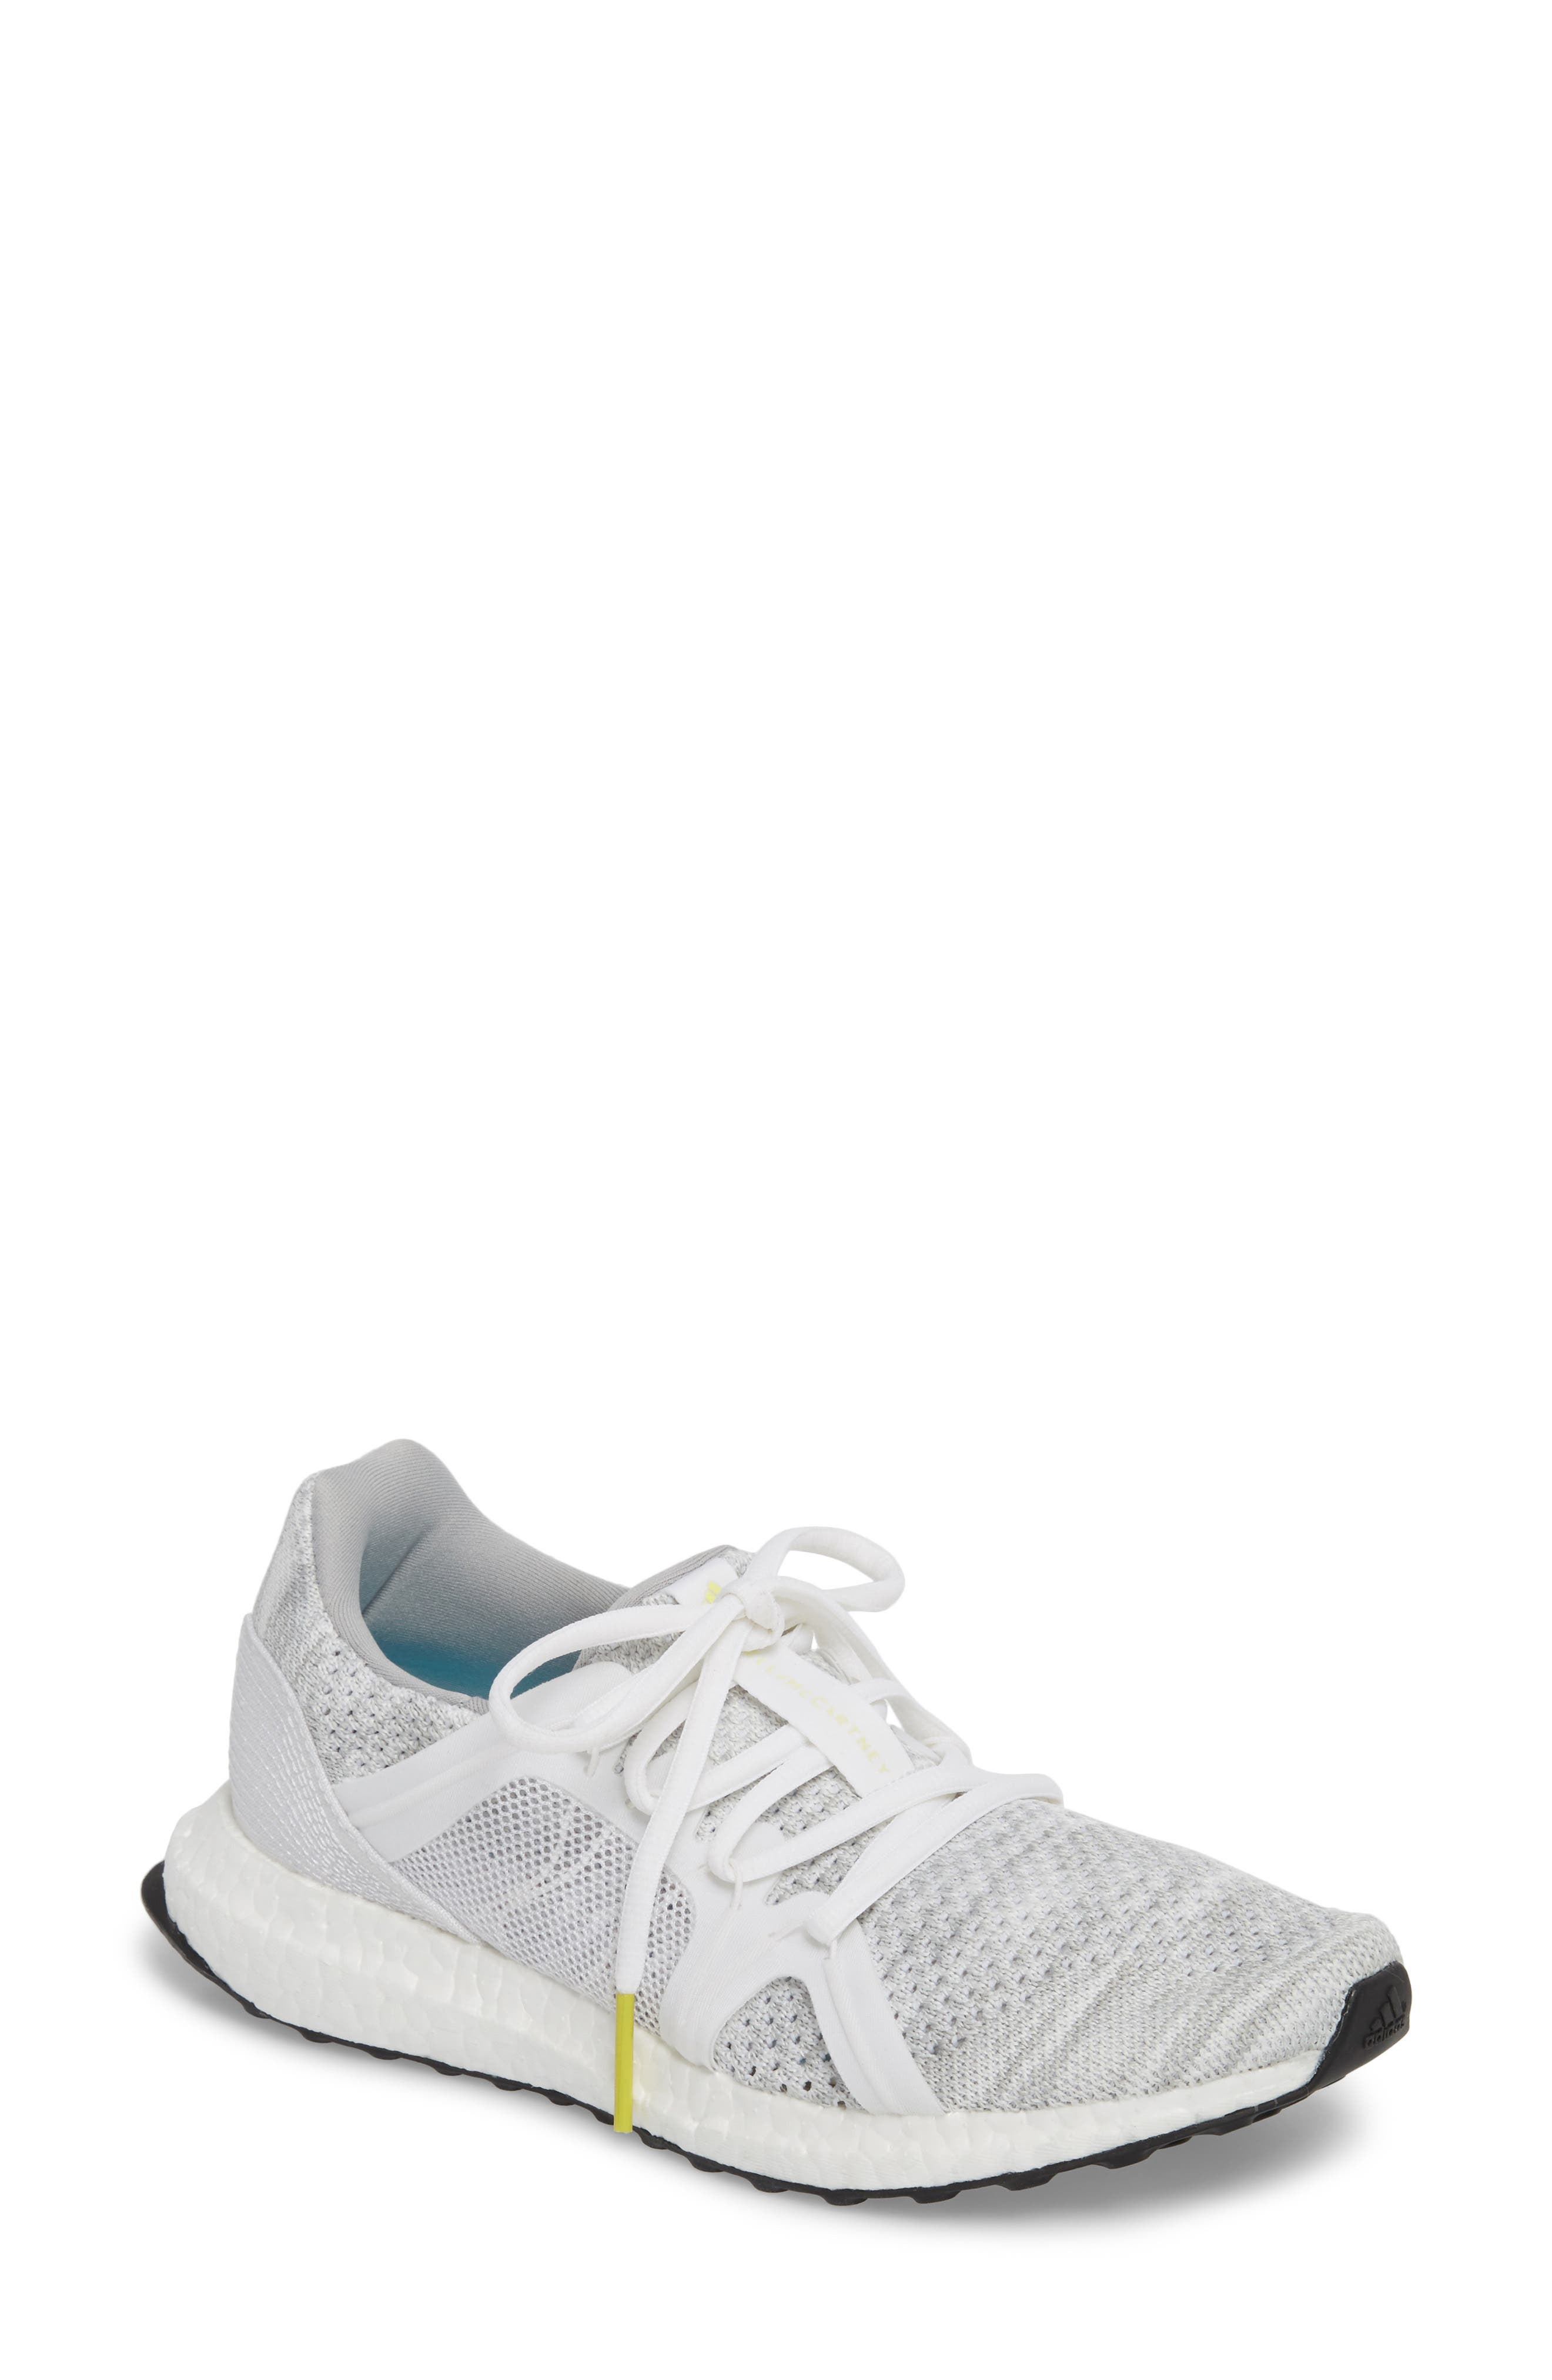 Main Image - adidas by Stella McCartney Ultraboost x Parley Running Shoe (Women)